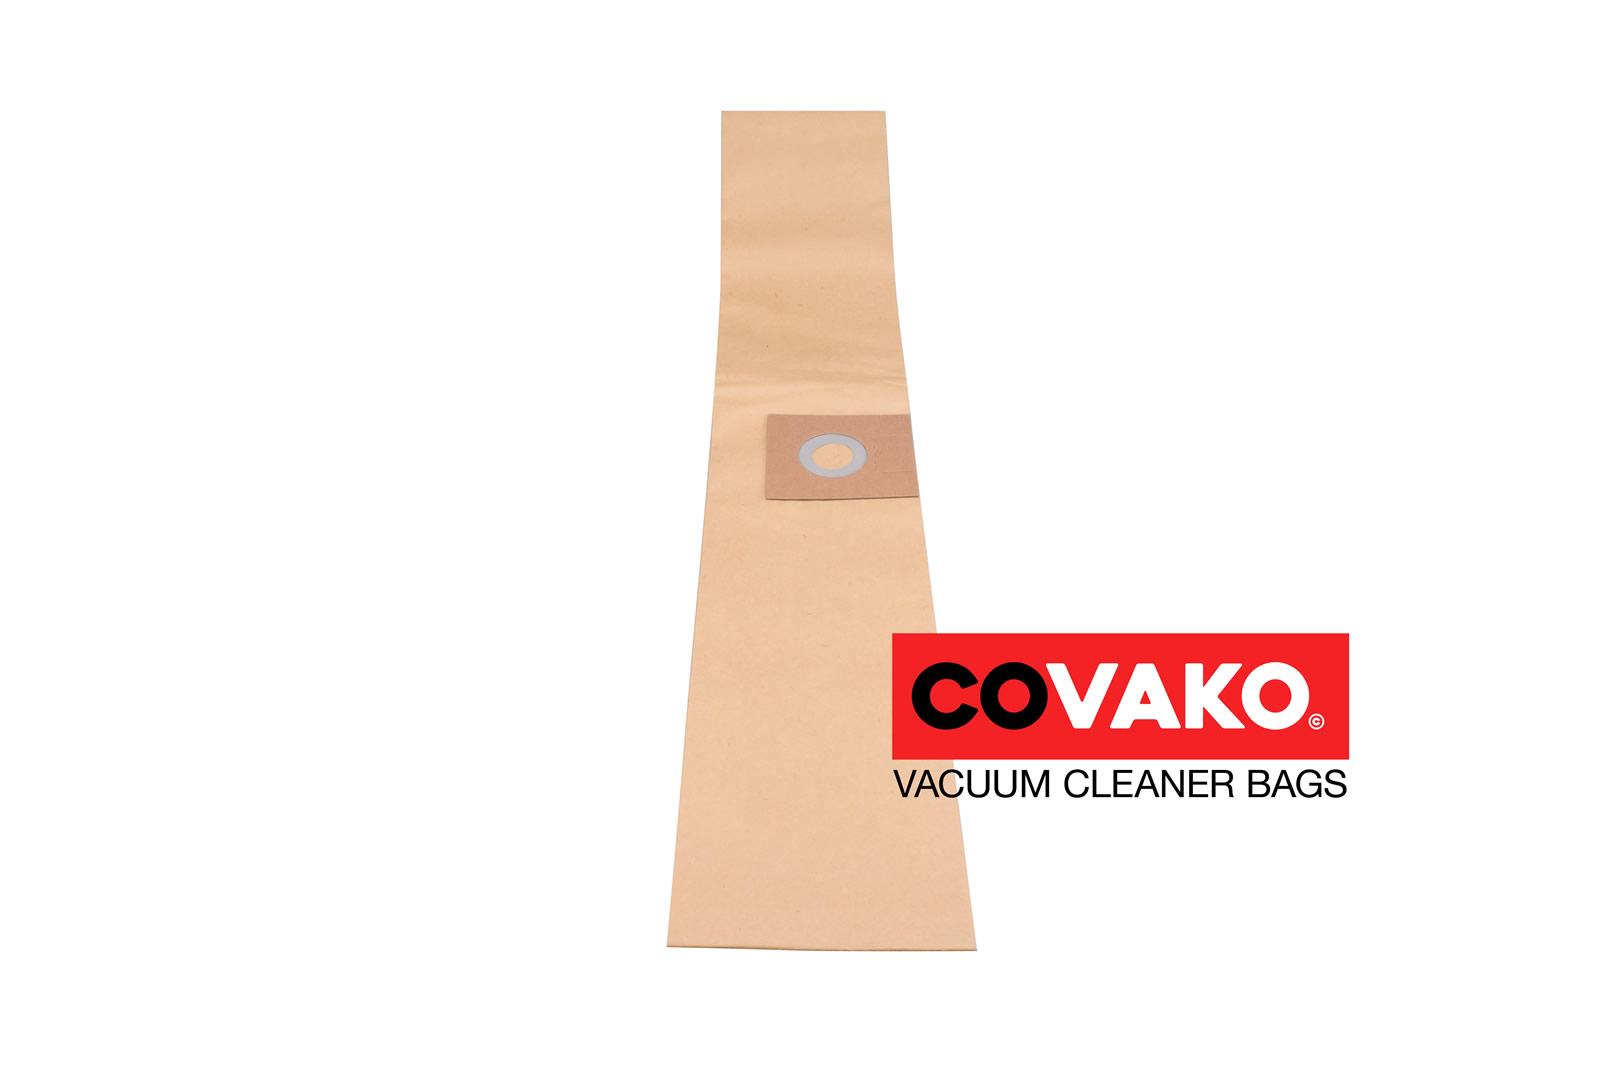 Floorpul Micros / Papier - Floorpul Staubsaugerbeutel